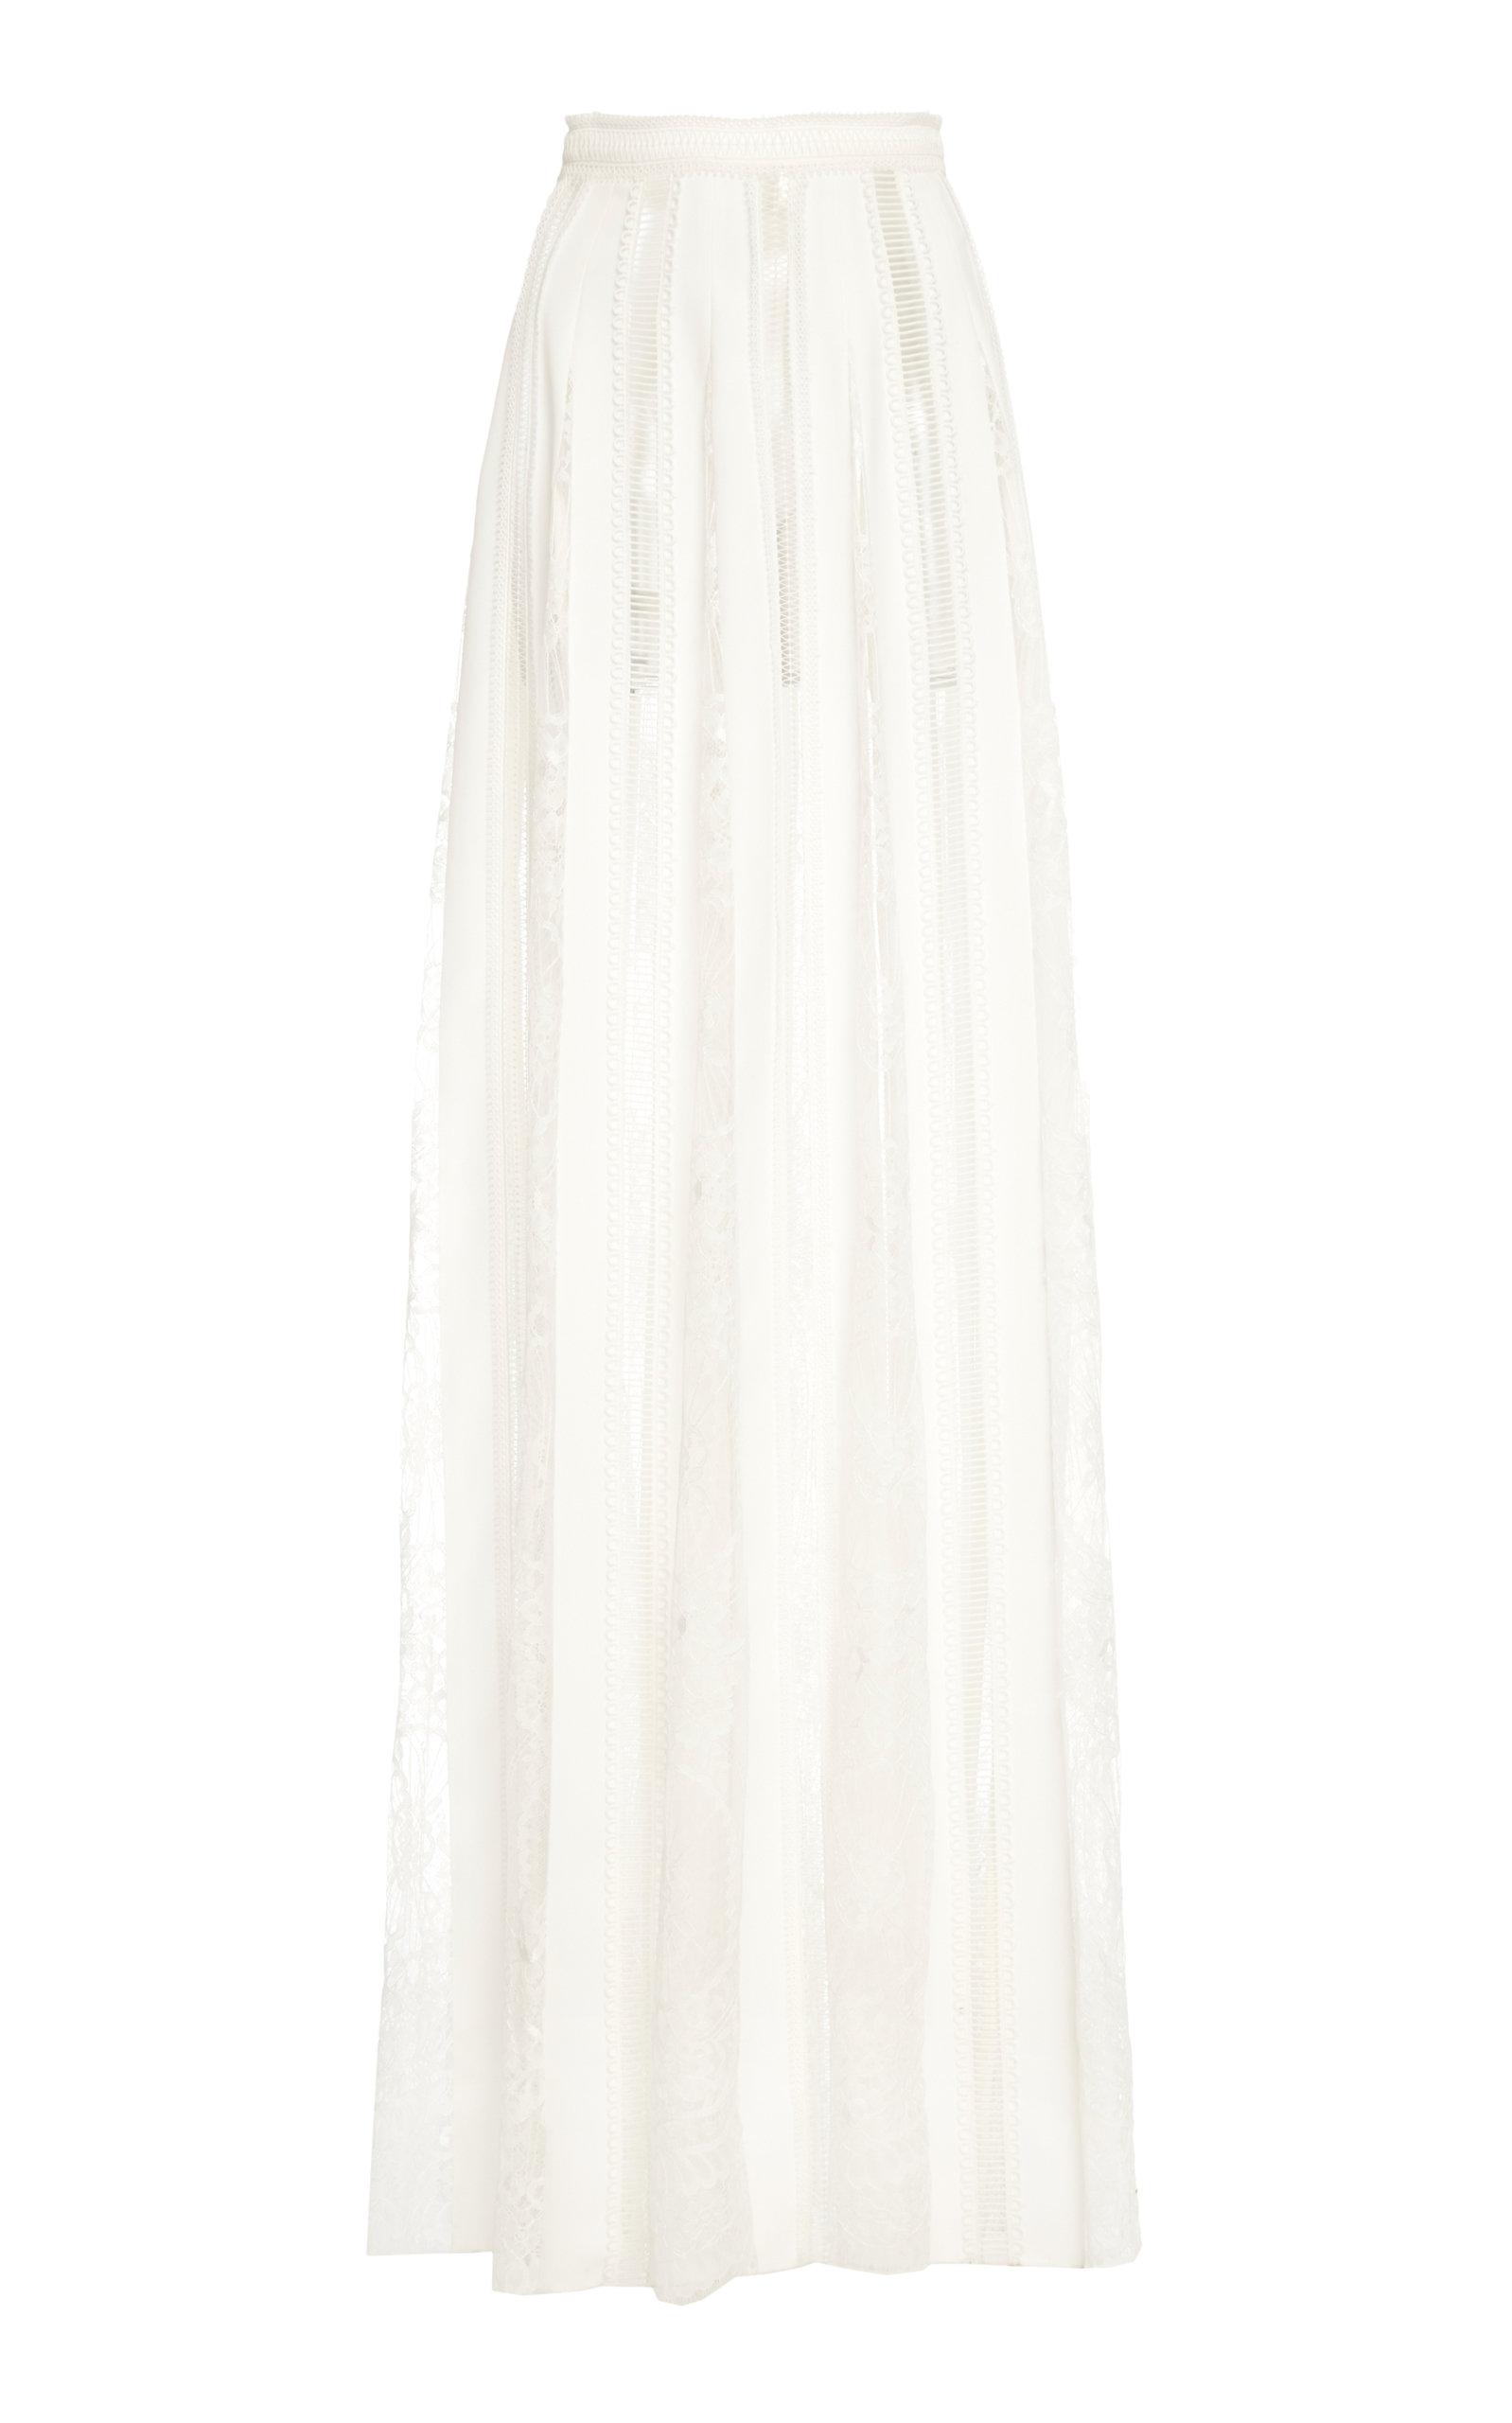 ZUHAIR MURAD | Zuhair Murad Lace Inset Floor Length Skirt | Goxip